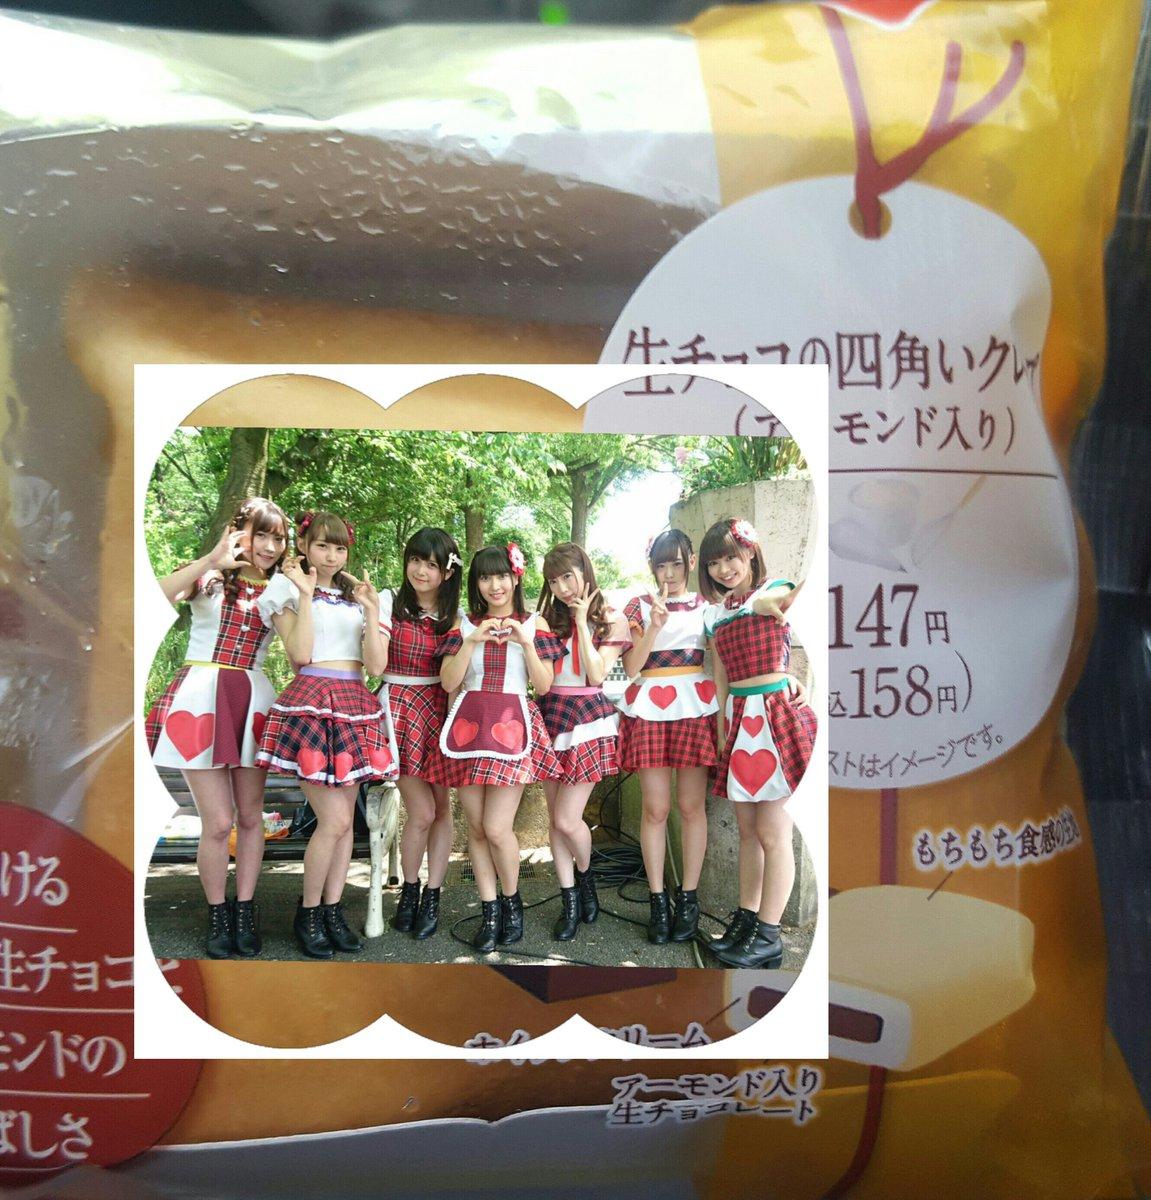 TIF2016 Tokyo Idol Festival 2016 反省会 day176 [無断転載禁止]©2ch.netYouTube動画>6本 ->画像>269枚